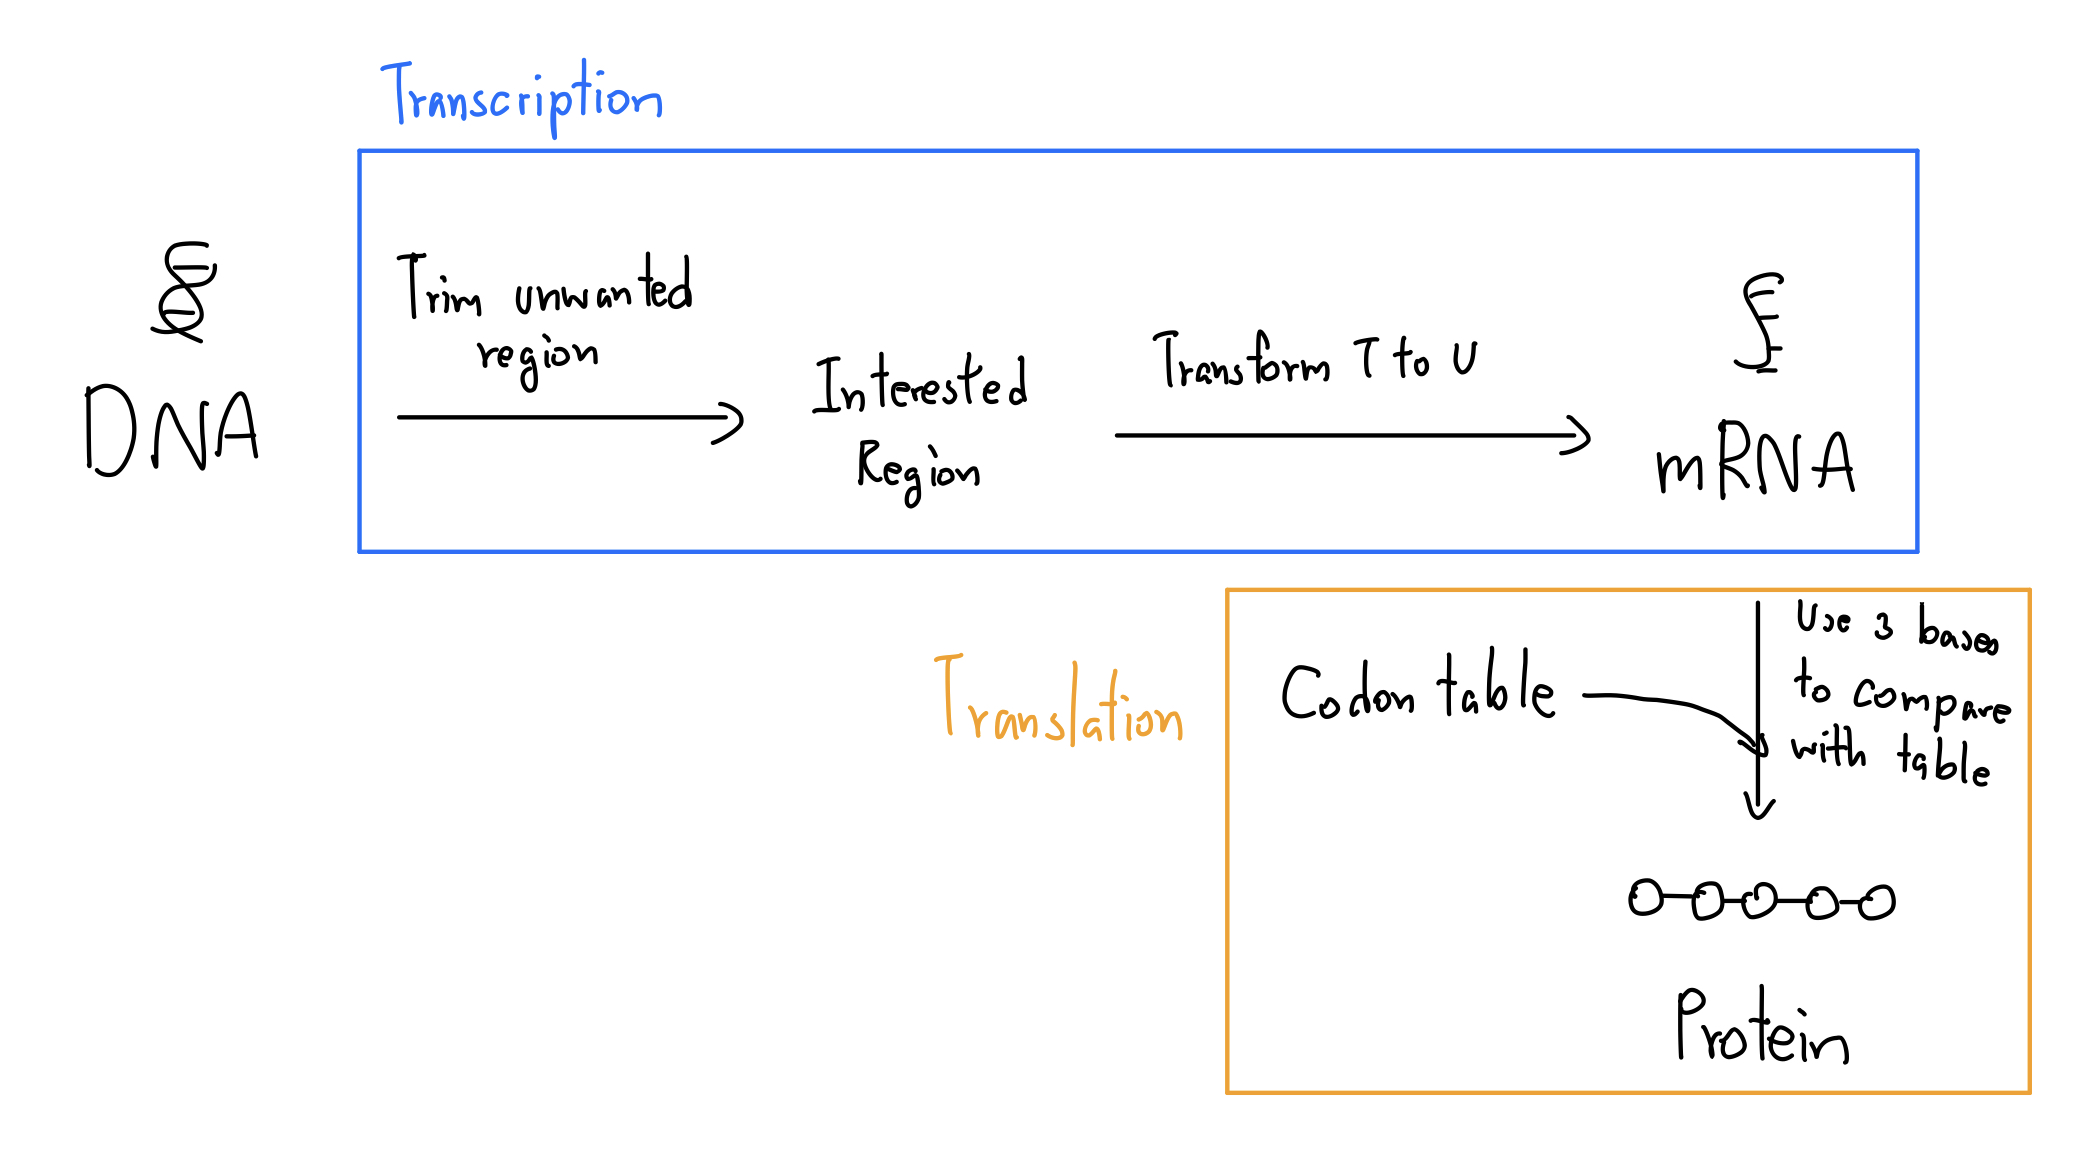 Systematic Thinking และ Scientific Method กับการเขียนโปรแกรม ที่จำเป็นต่อทุกคน